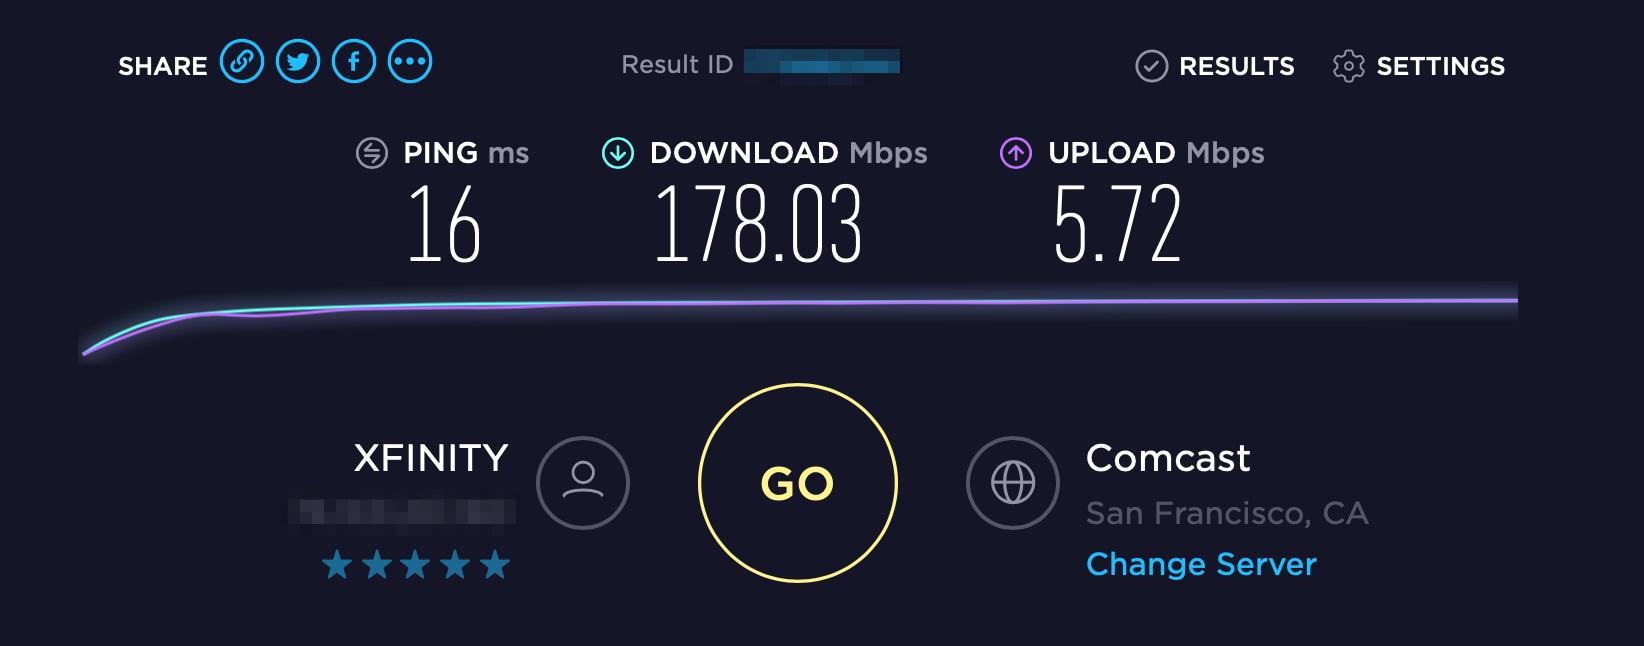 Comcast Speed Test